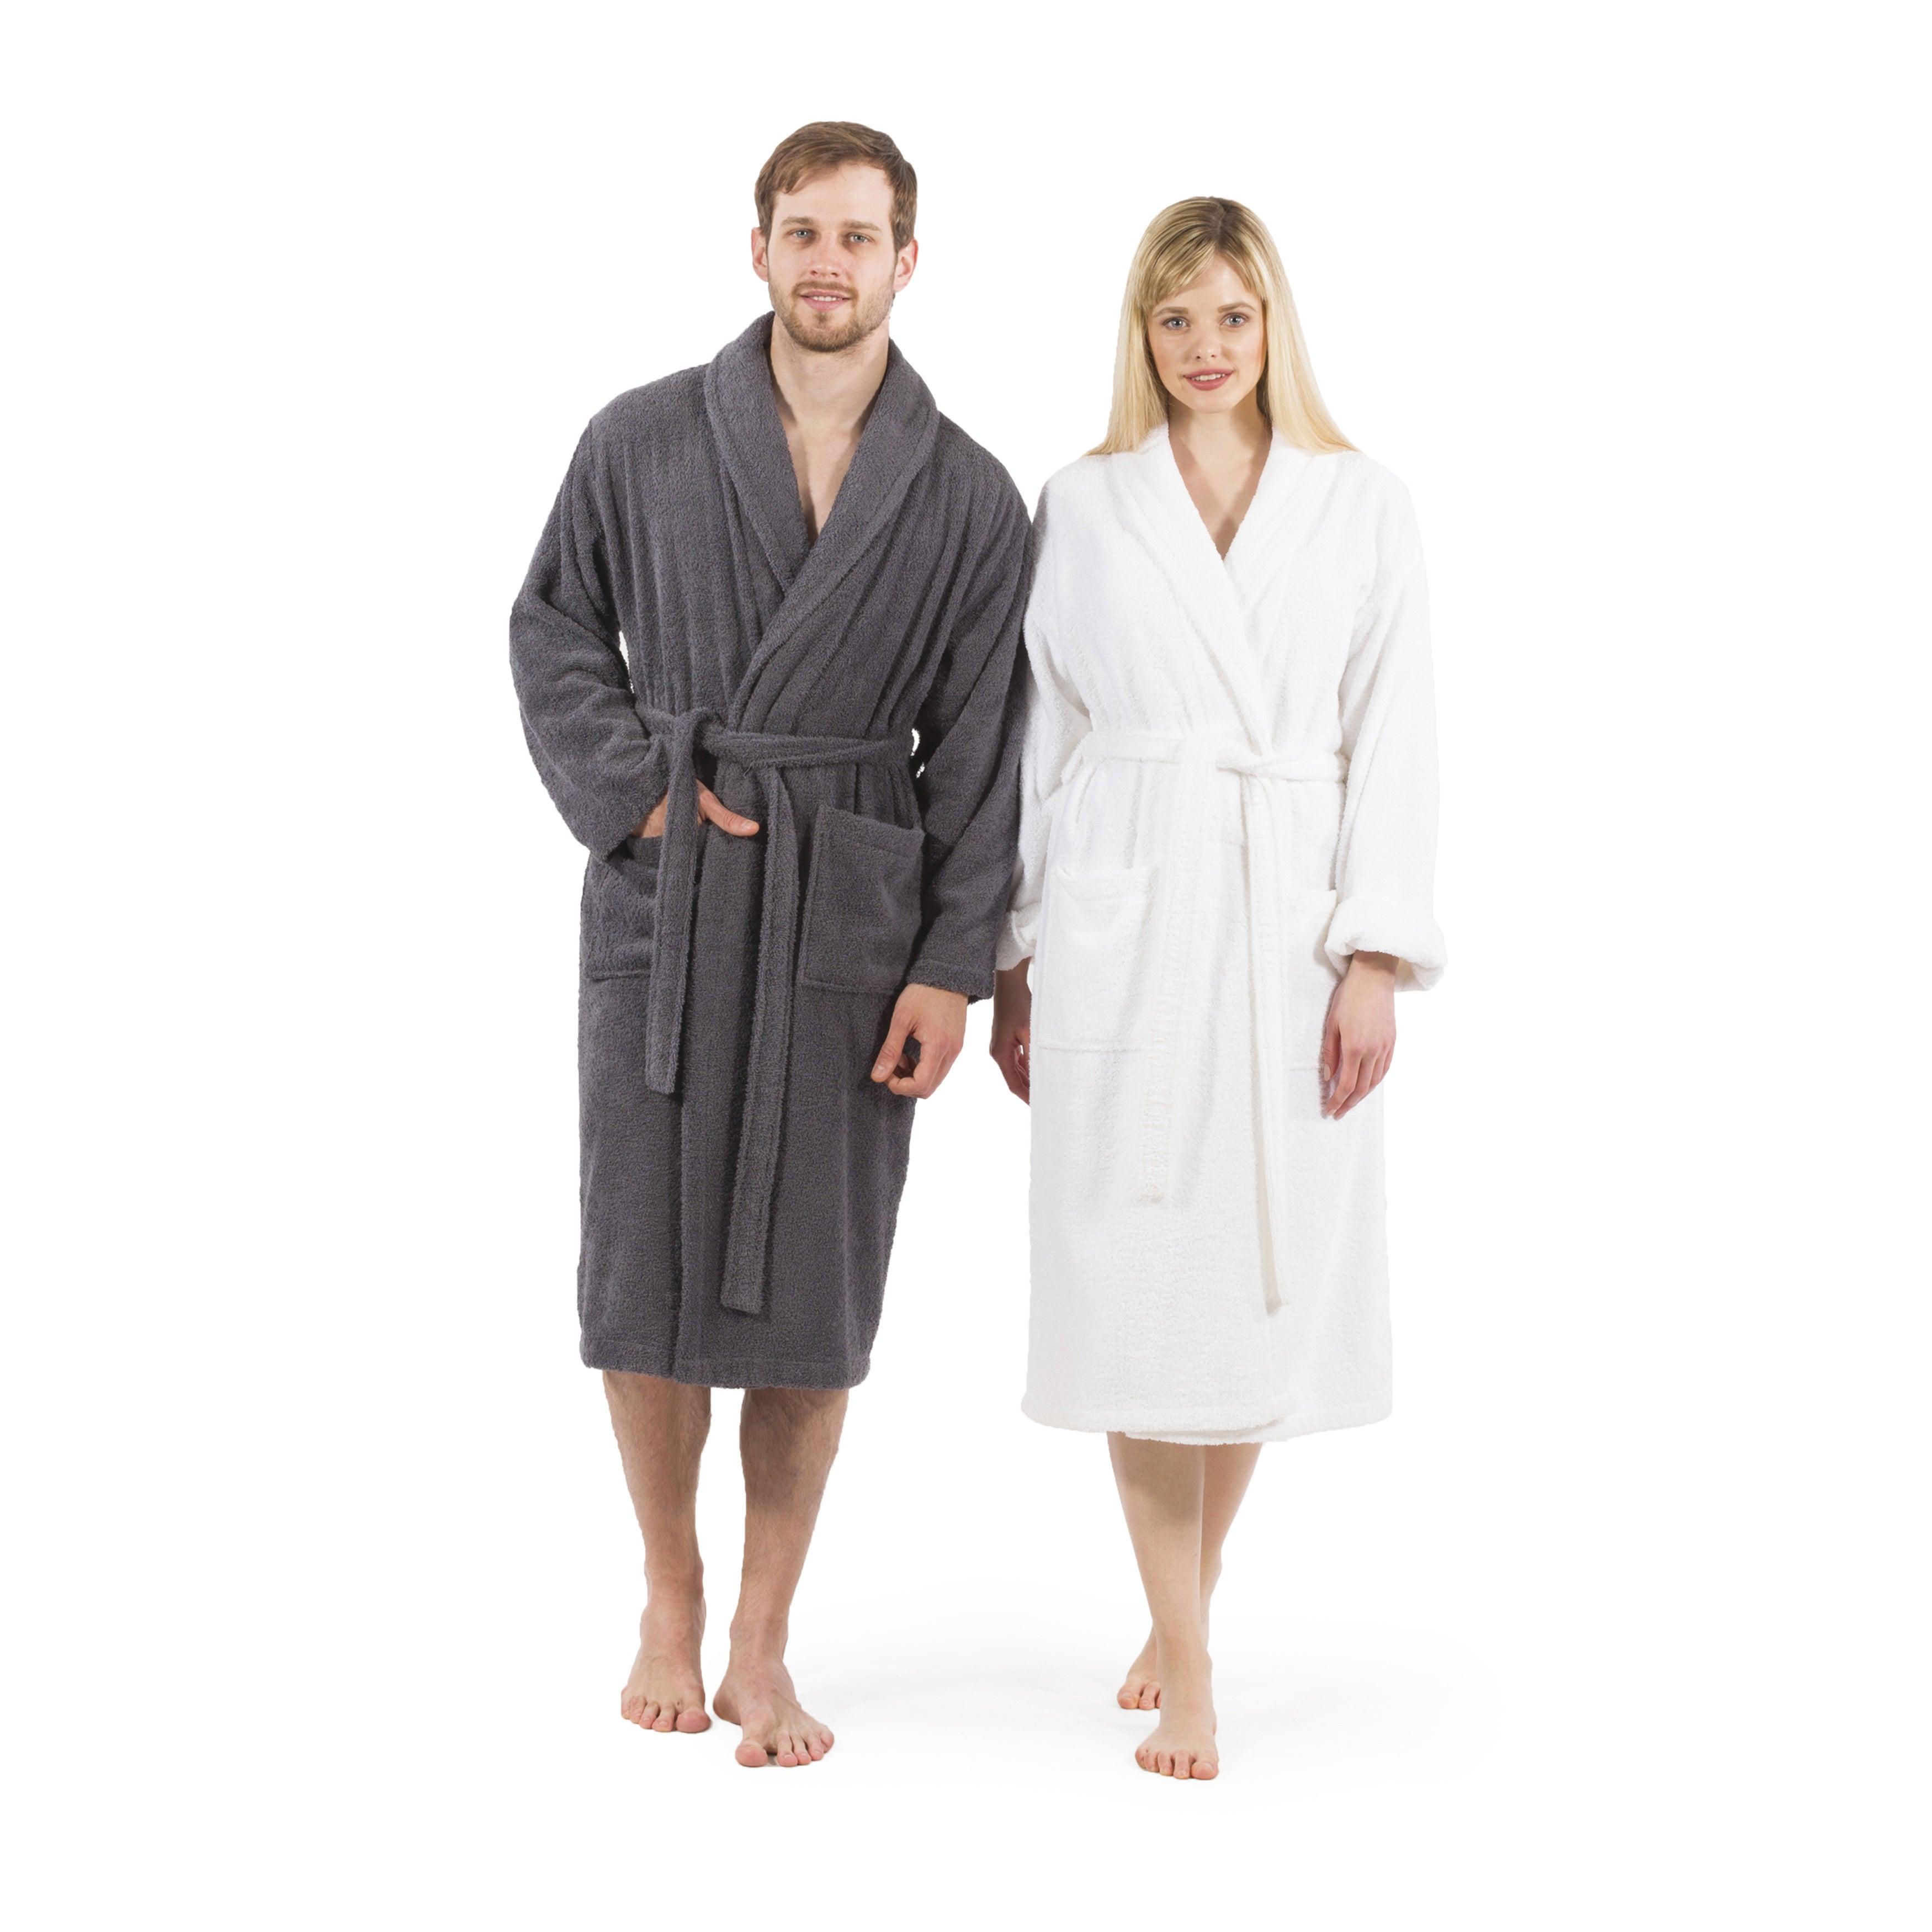 Authentic Hotel Spa Unisex Turkish Cotton Terry Cloth Bath